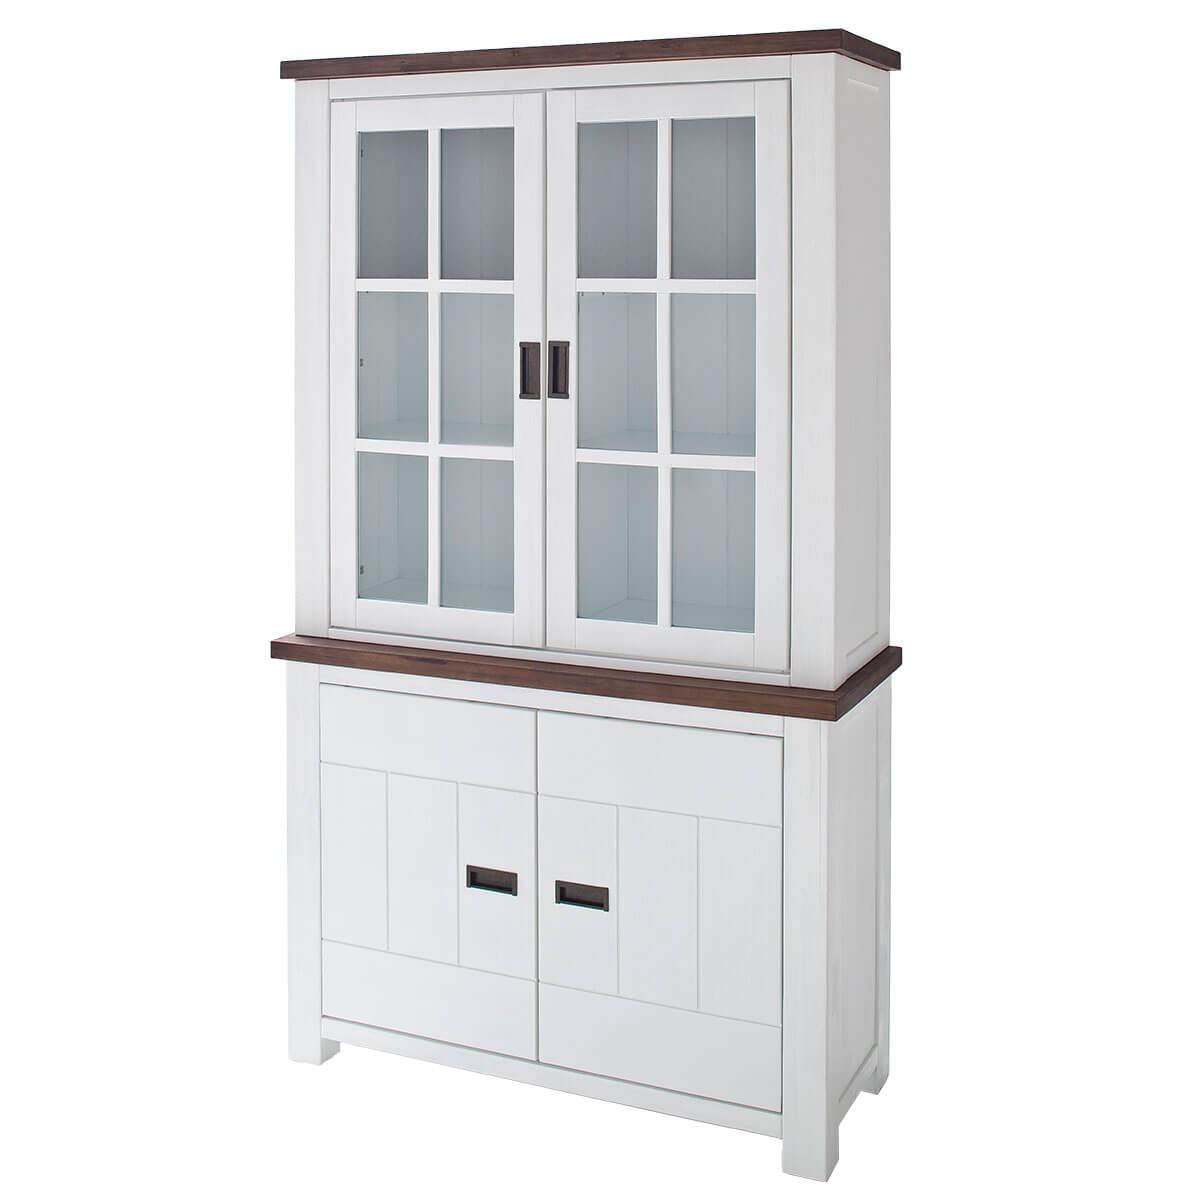 buffet akazie massiv wei braun vitrine massivholz schrank. Black Bedroom Furniture Sets. Home Design Ideas